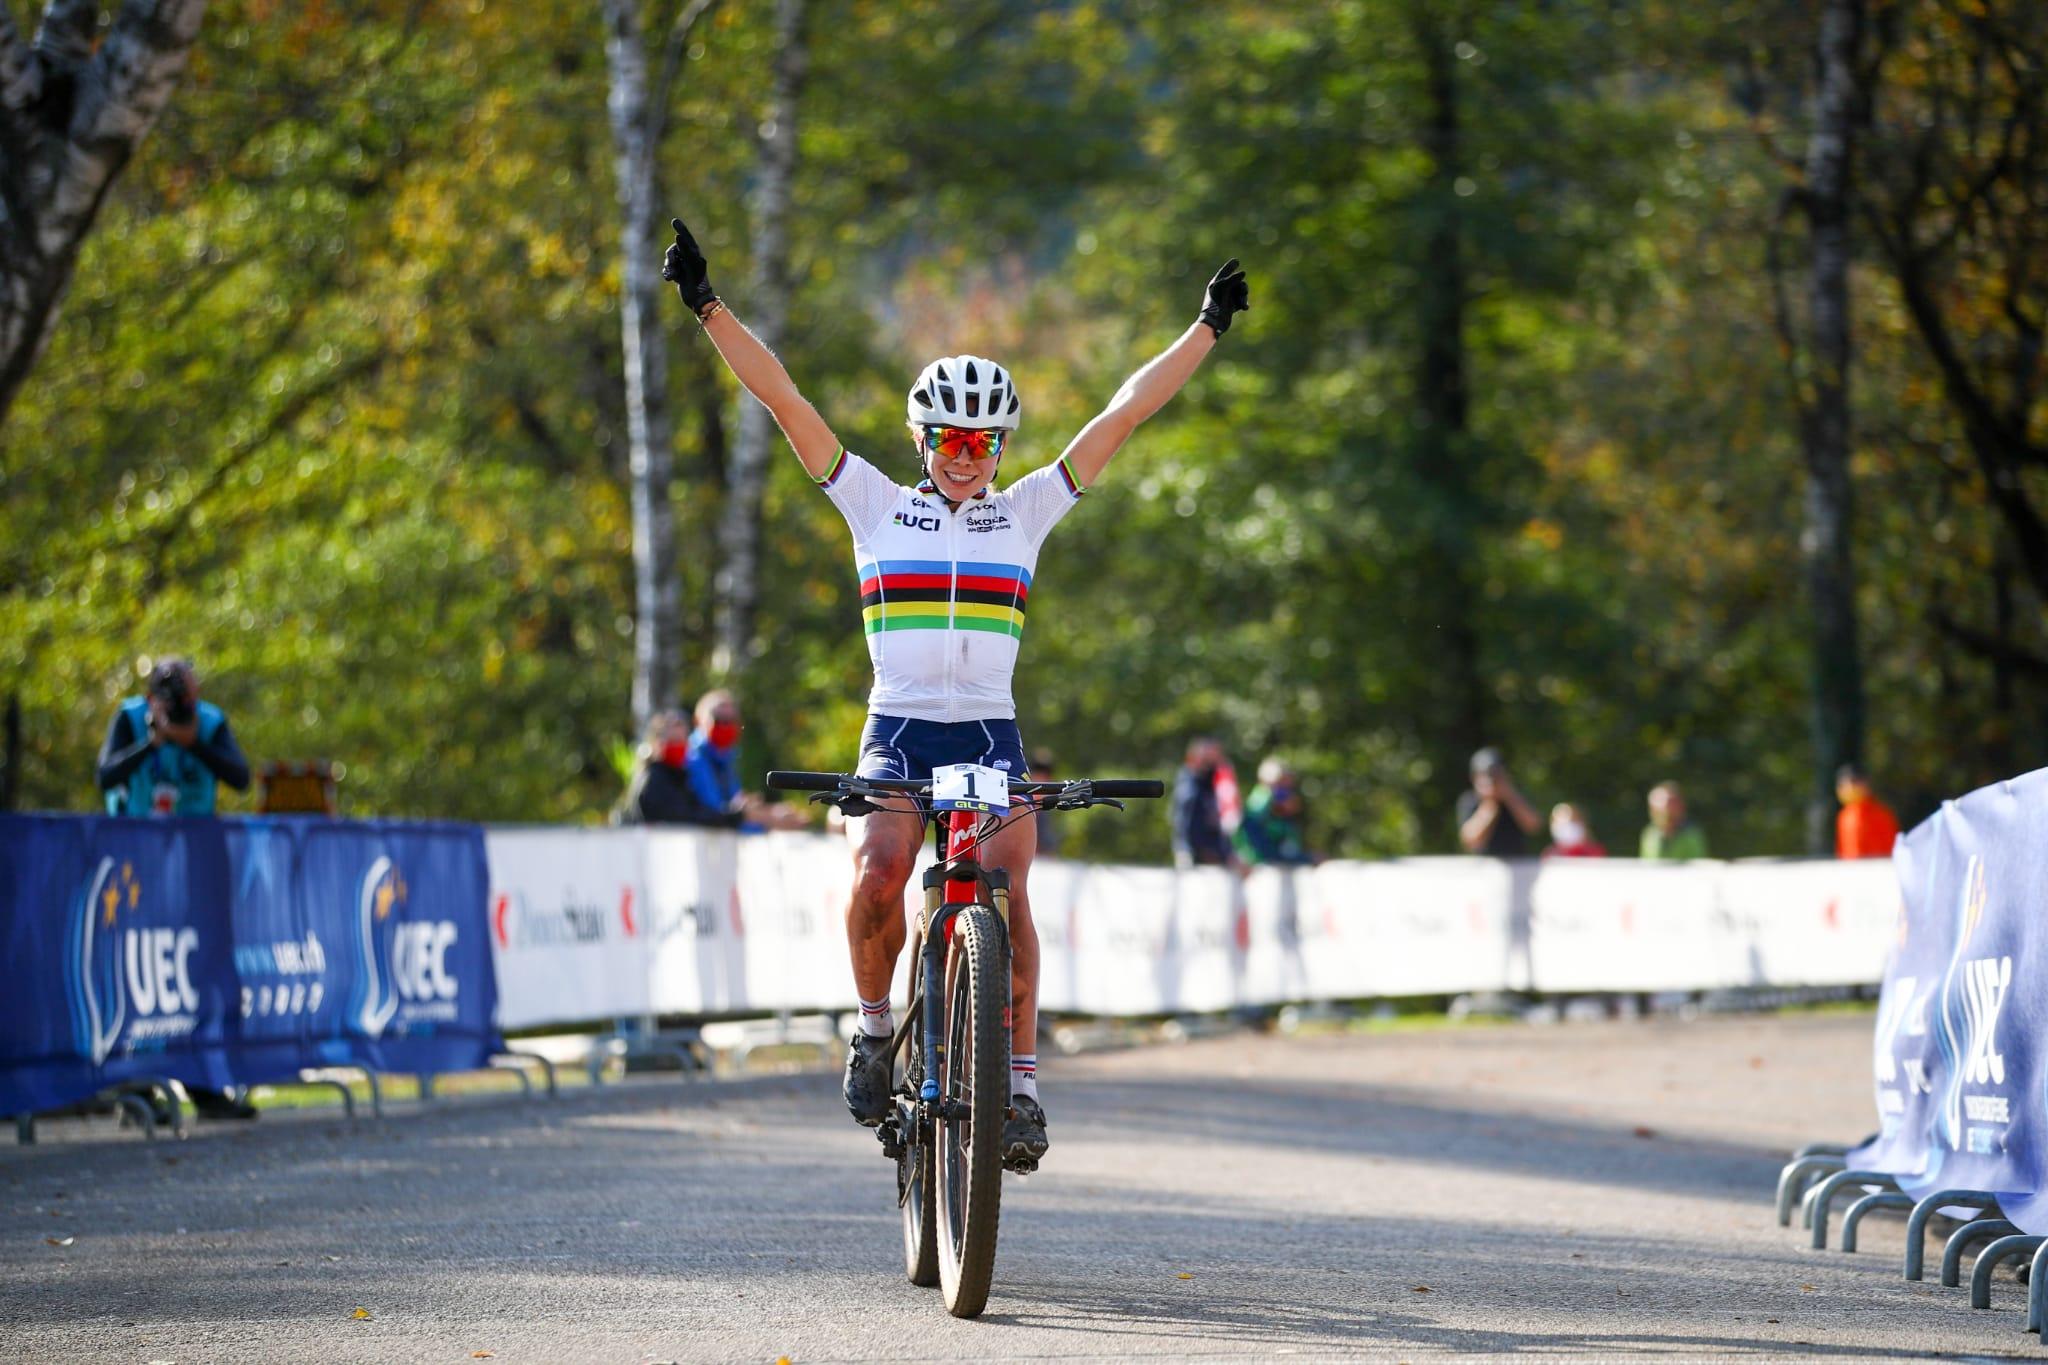 Loana Lecomte vince il Campionato Europeo XCO Donne U23 (foto Michele Mondini/BettiniPhoto/UEC)